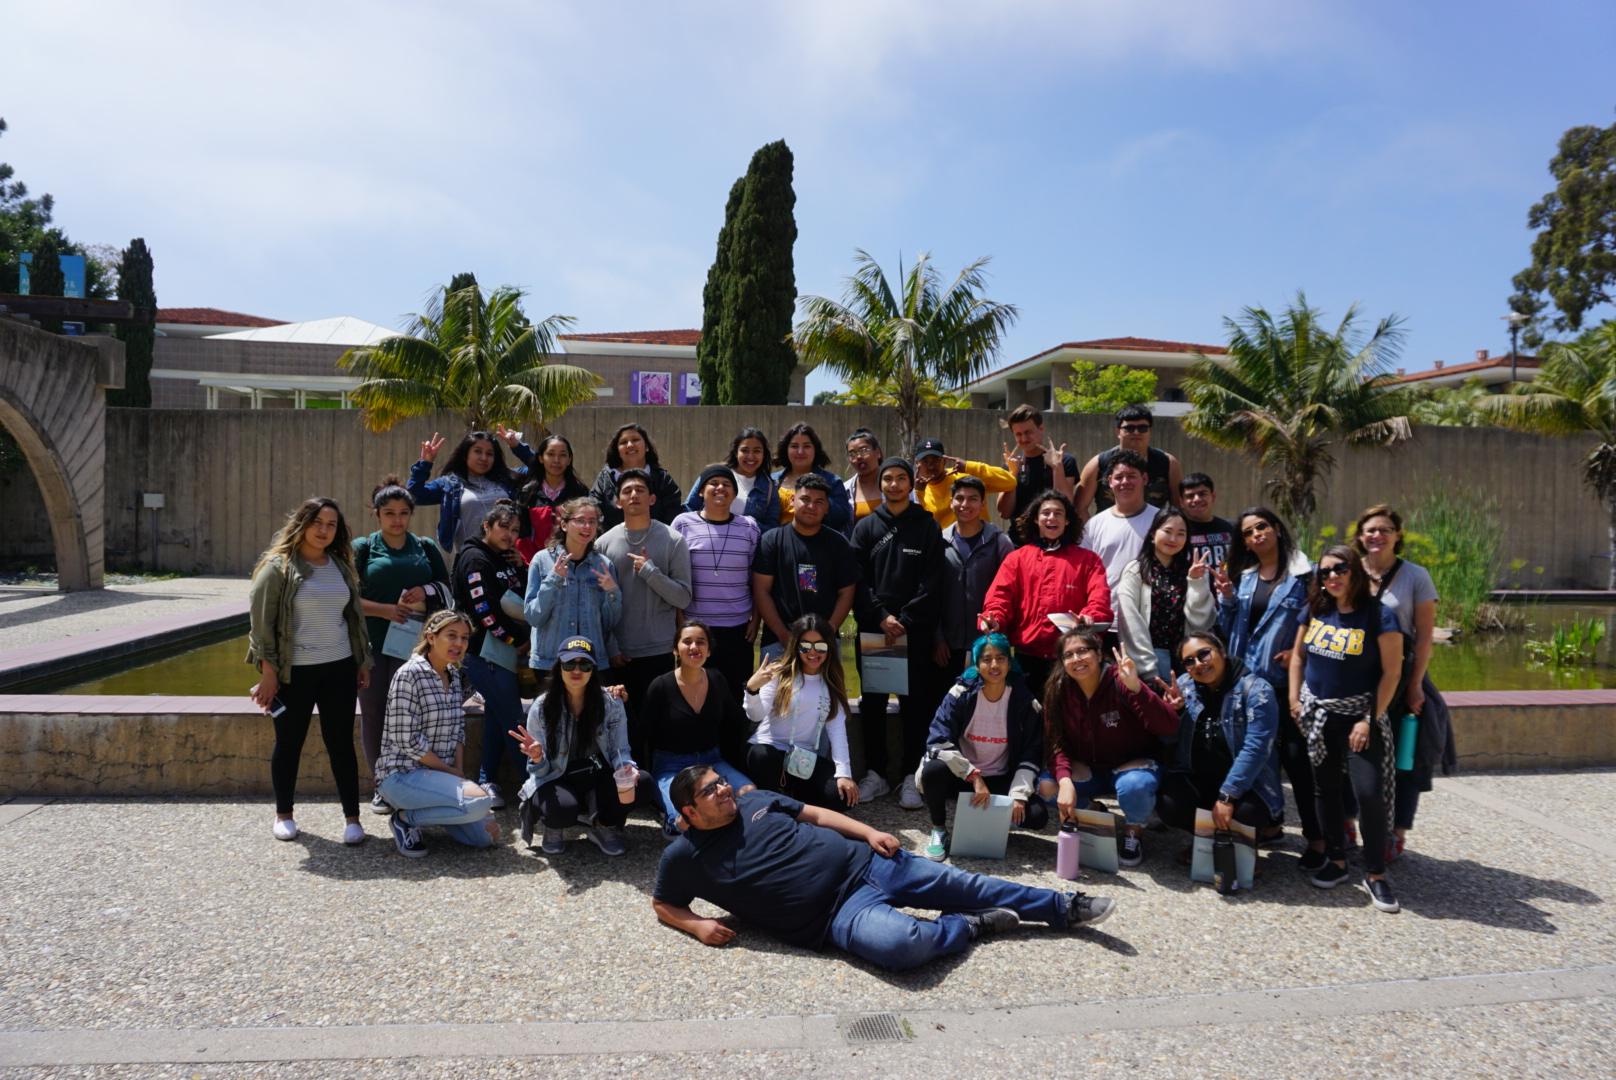 2019 UC Santa Barbara Campus Tour